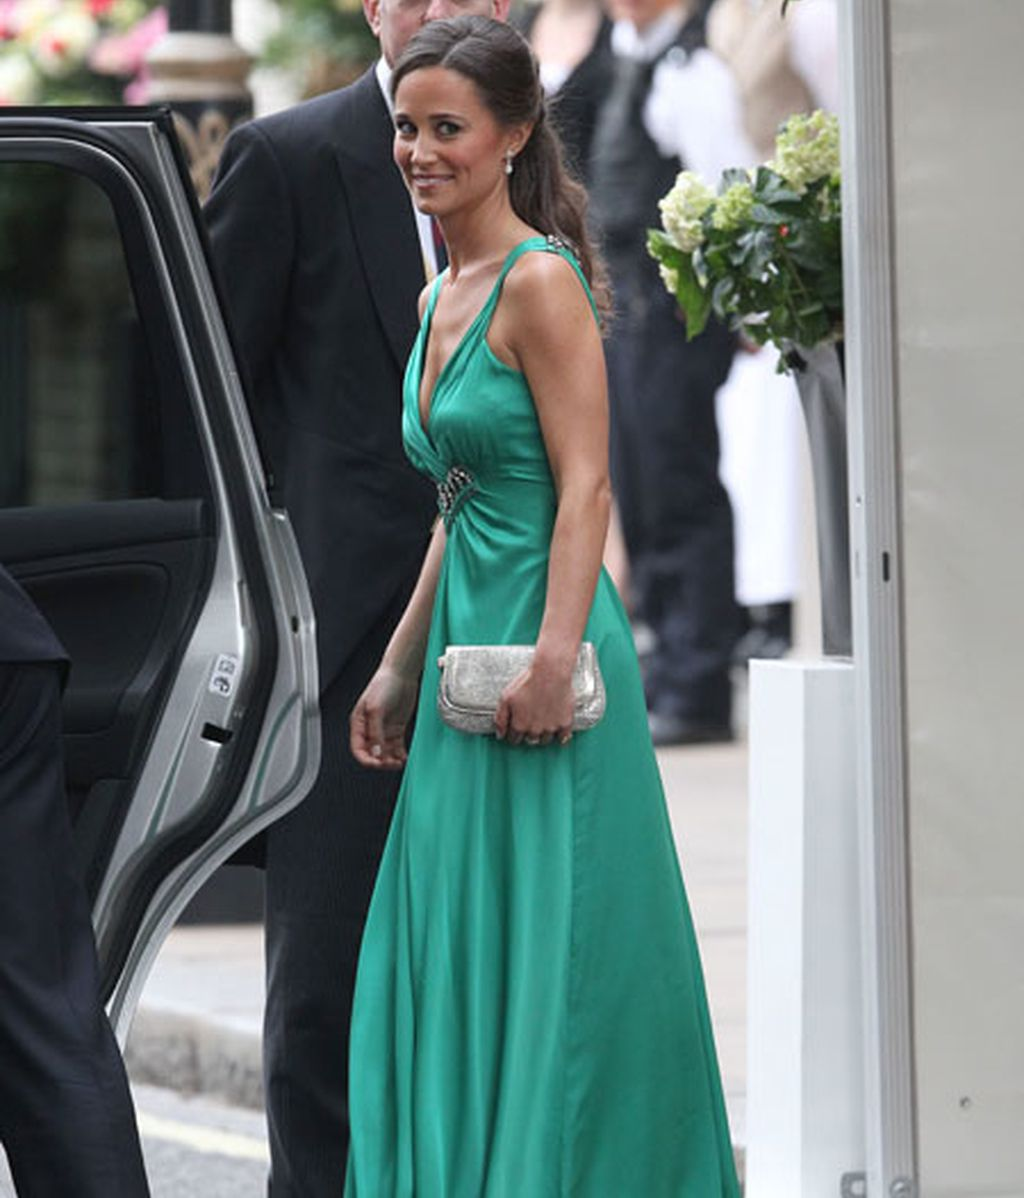 Pippa Middleton, la otra gran protagonista de la boda real